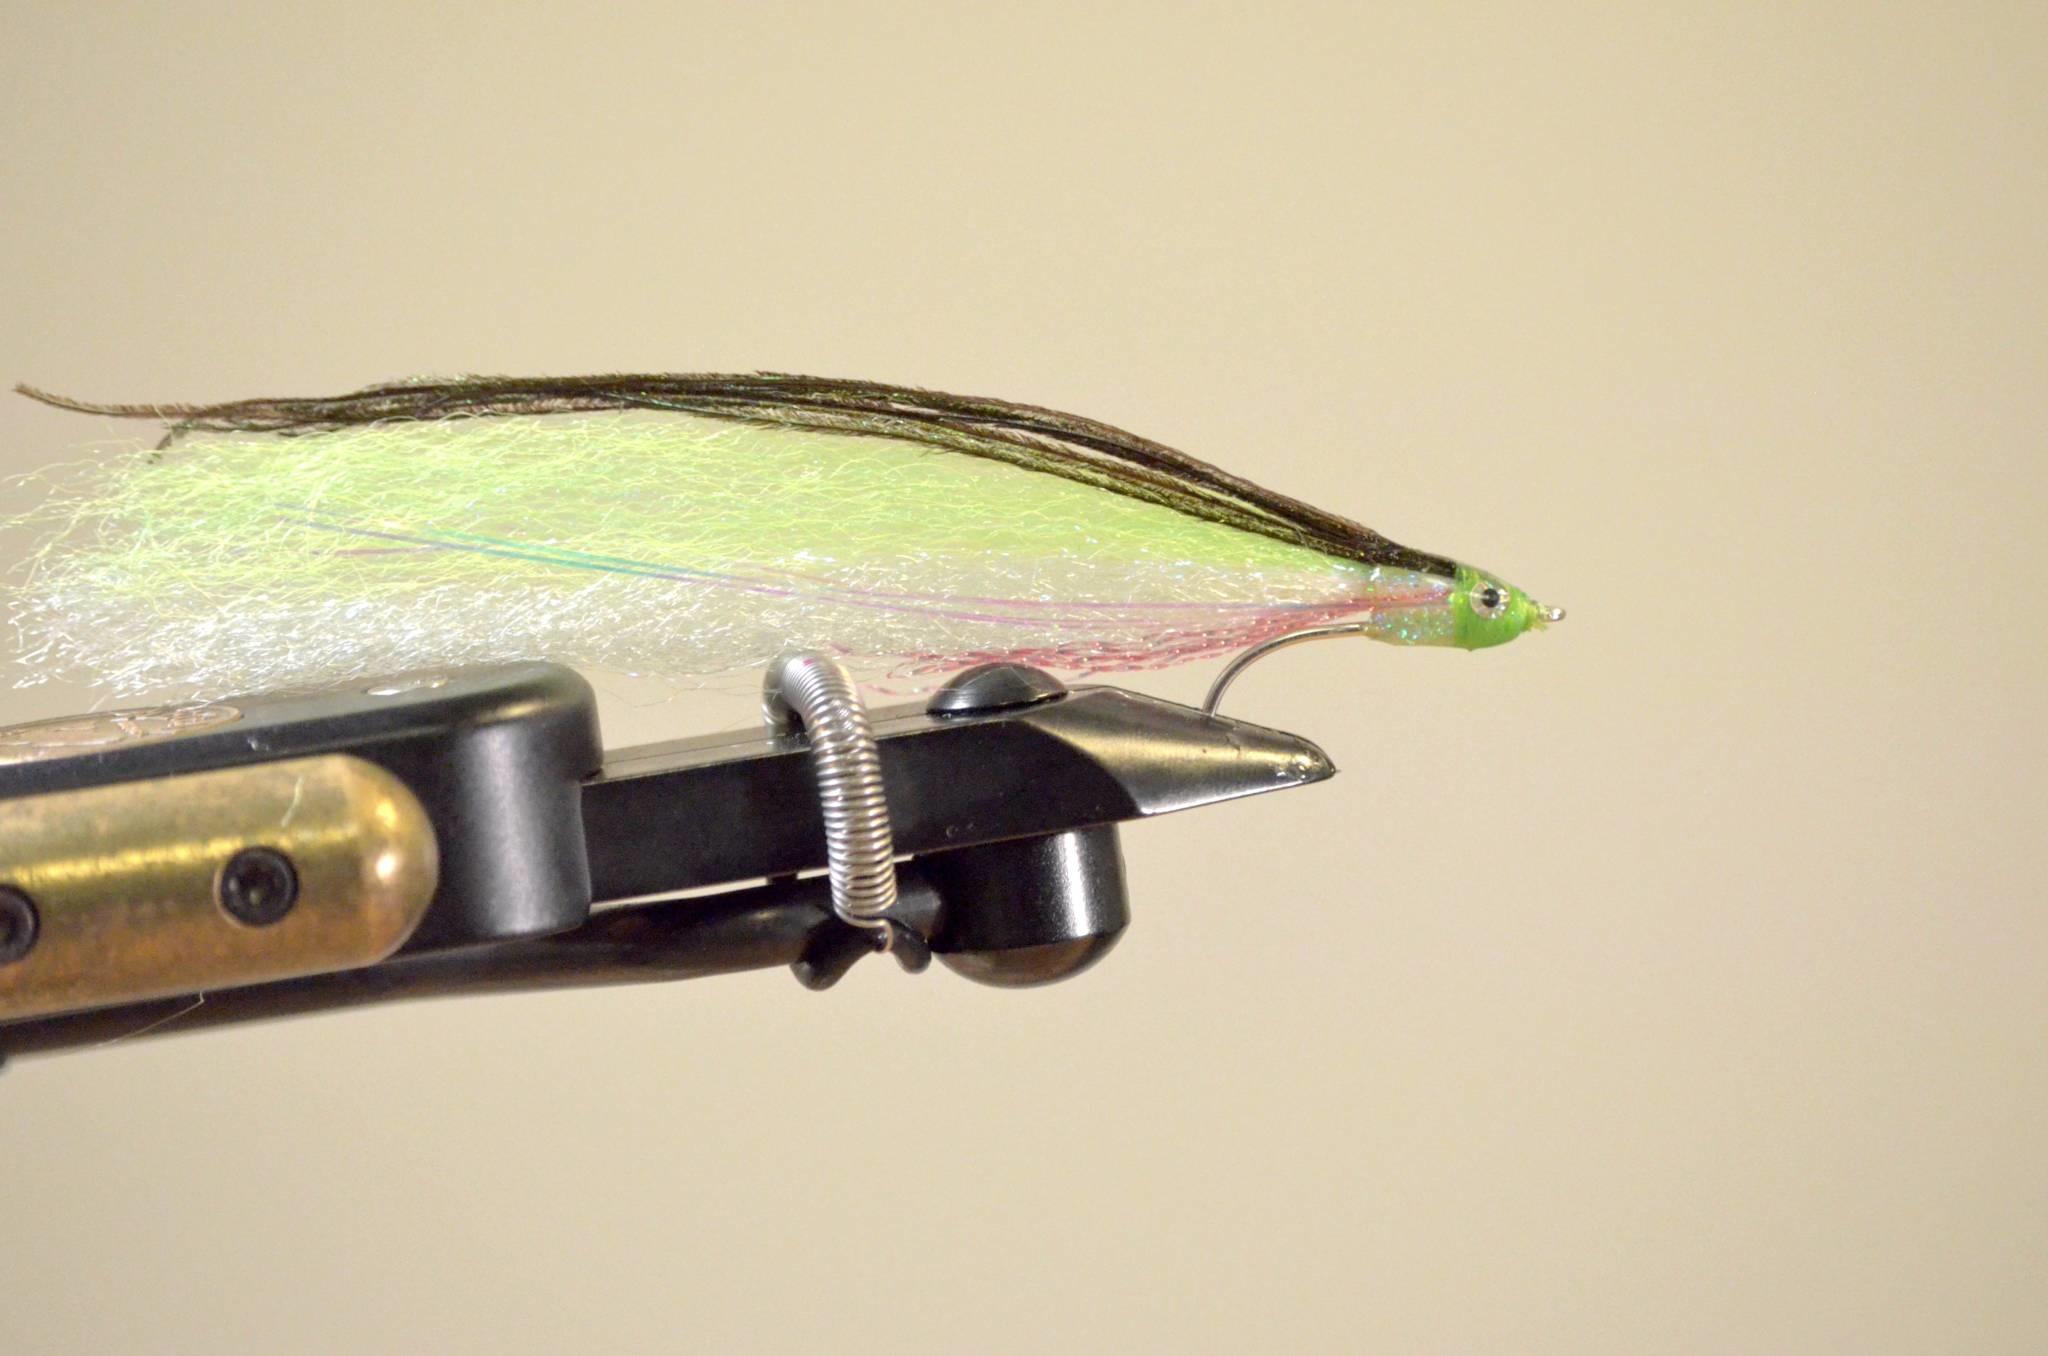 Urban Angler Fly Tying Kit - EP Striper EnricoTail